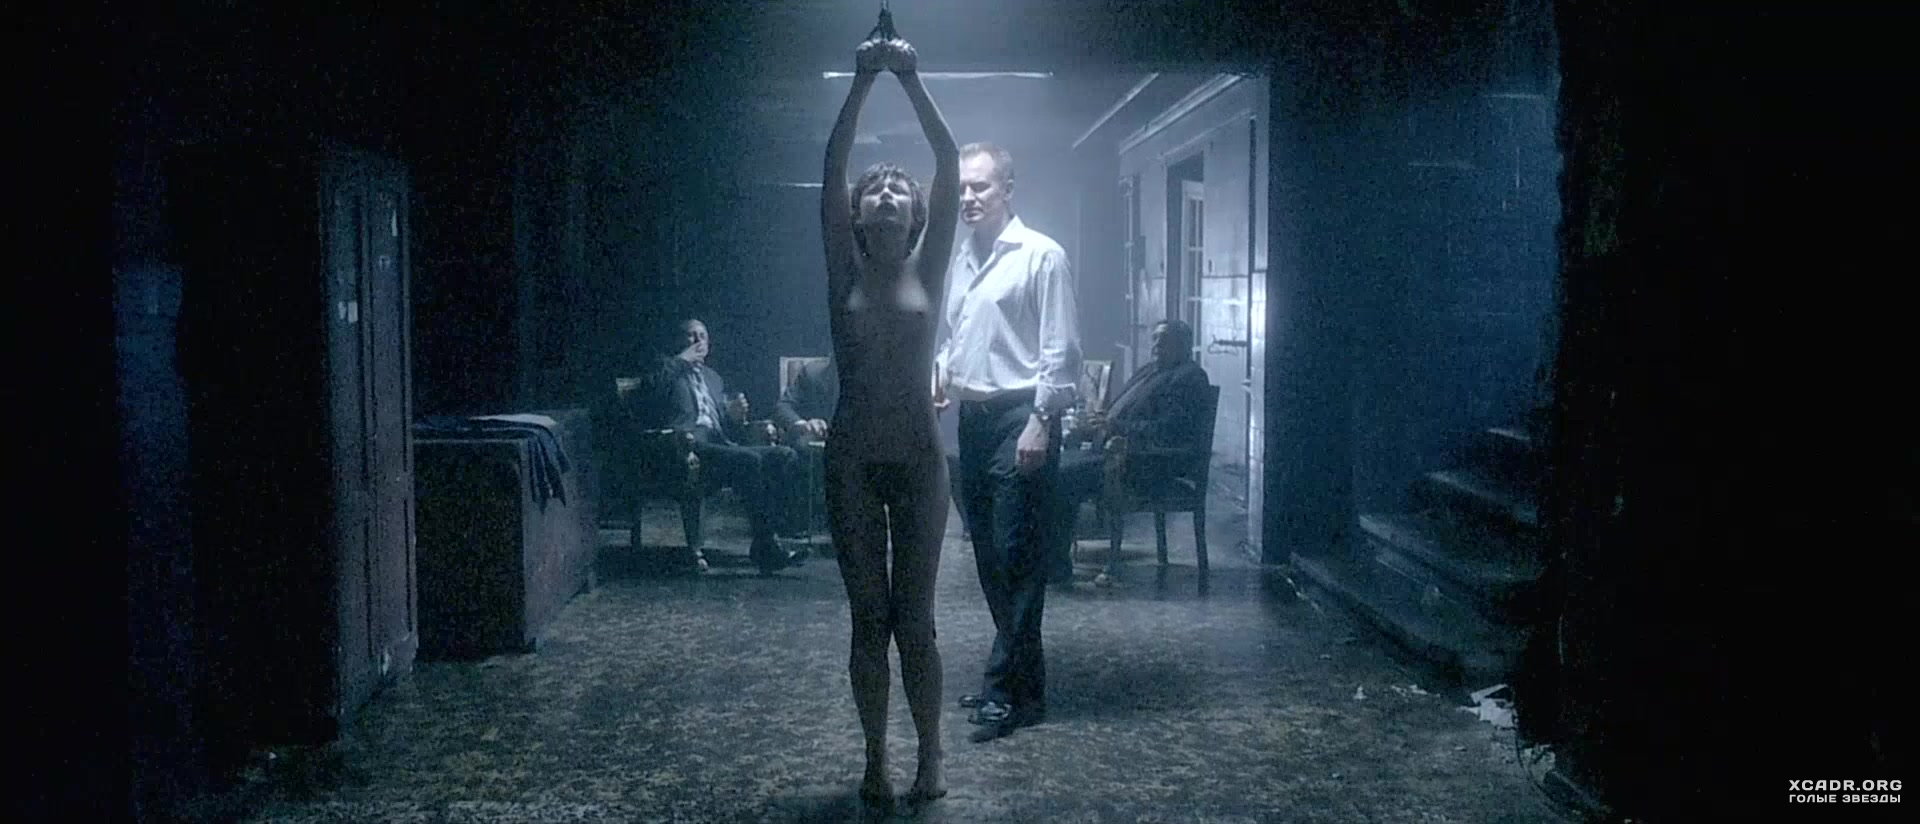 Hitman nude scene nude scene